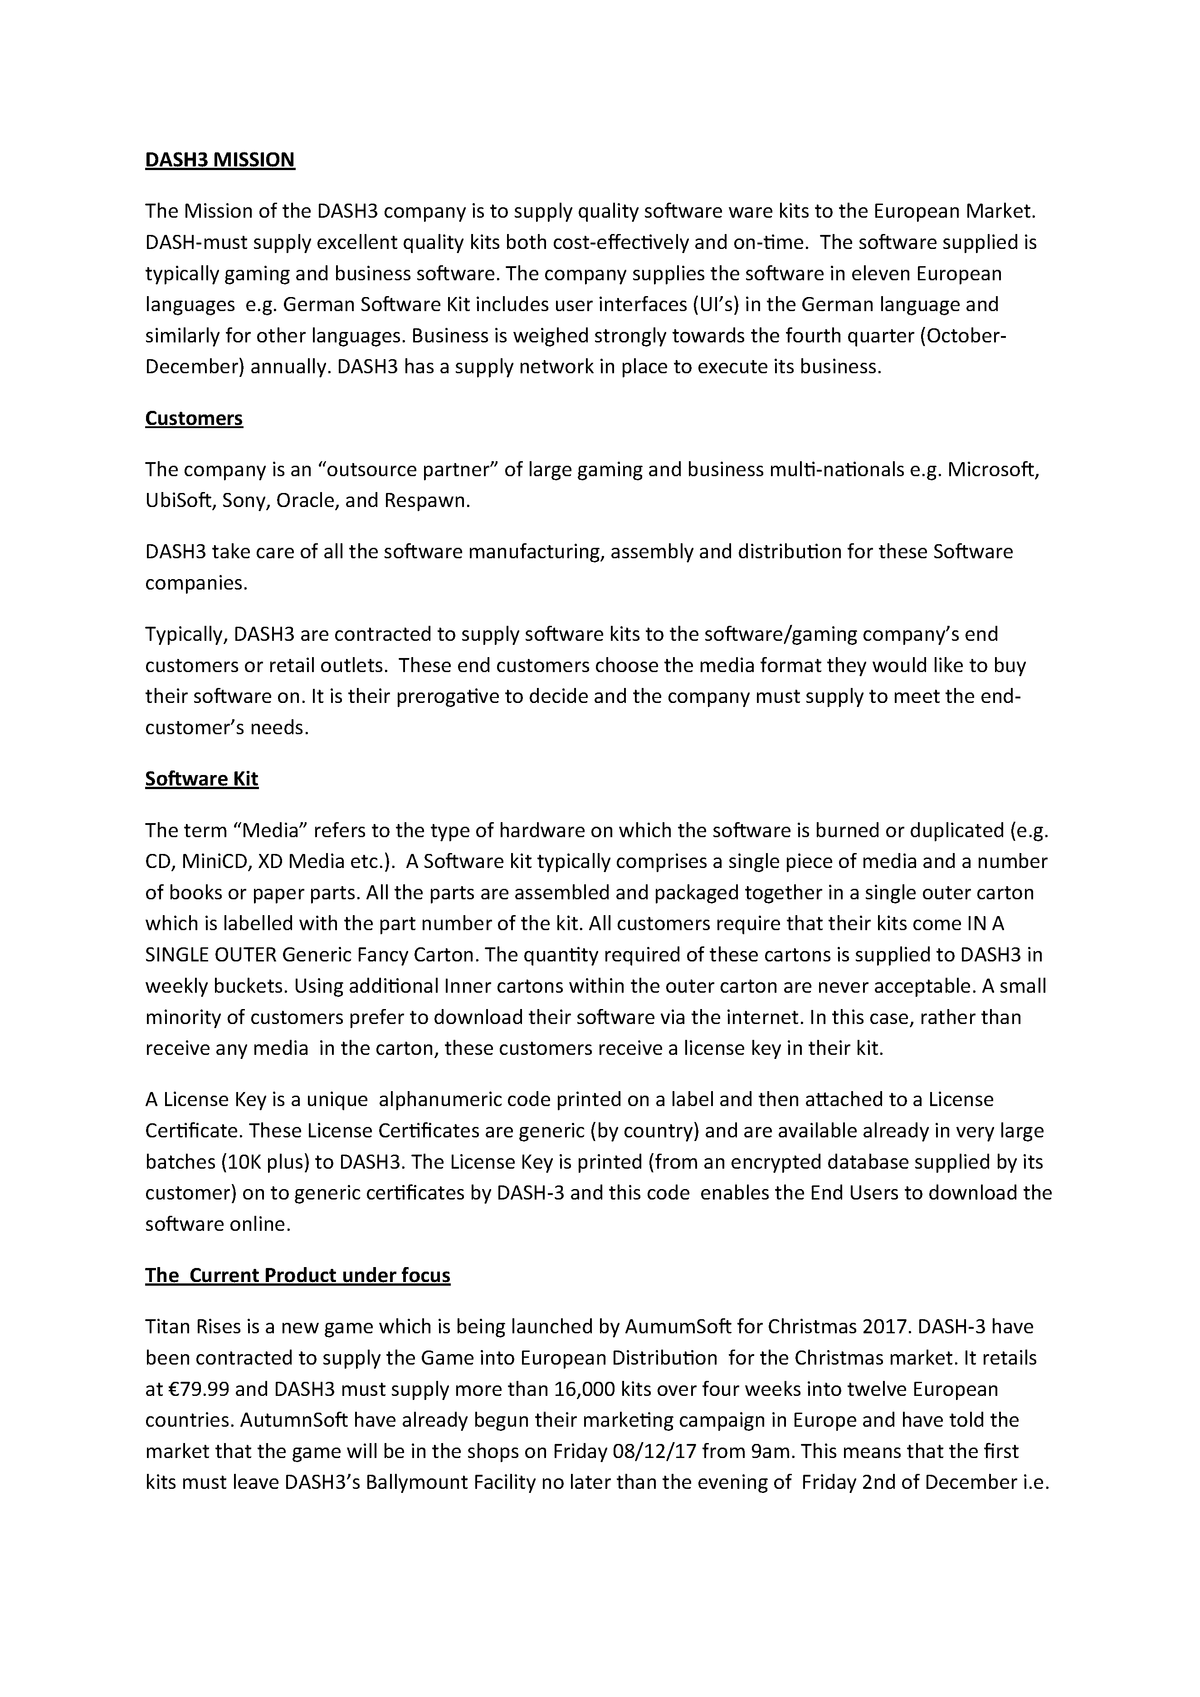 Assignment 2 DASH 3 - MMAN3103: Manufacturing Management - StuDocu